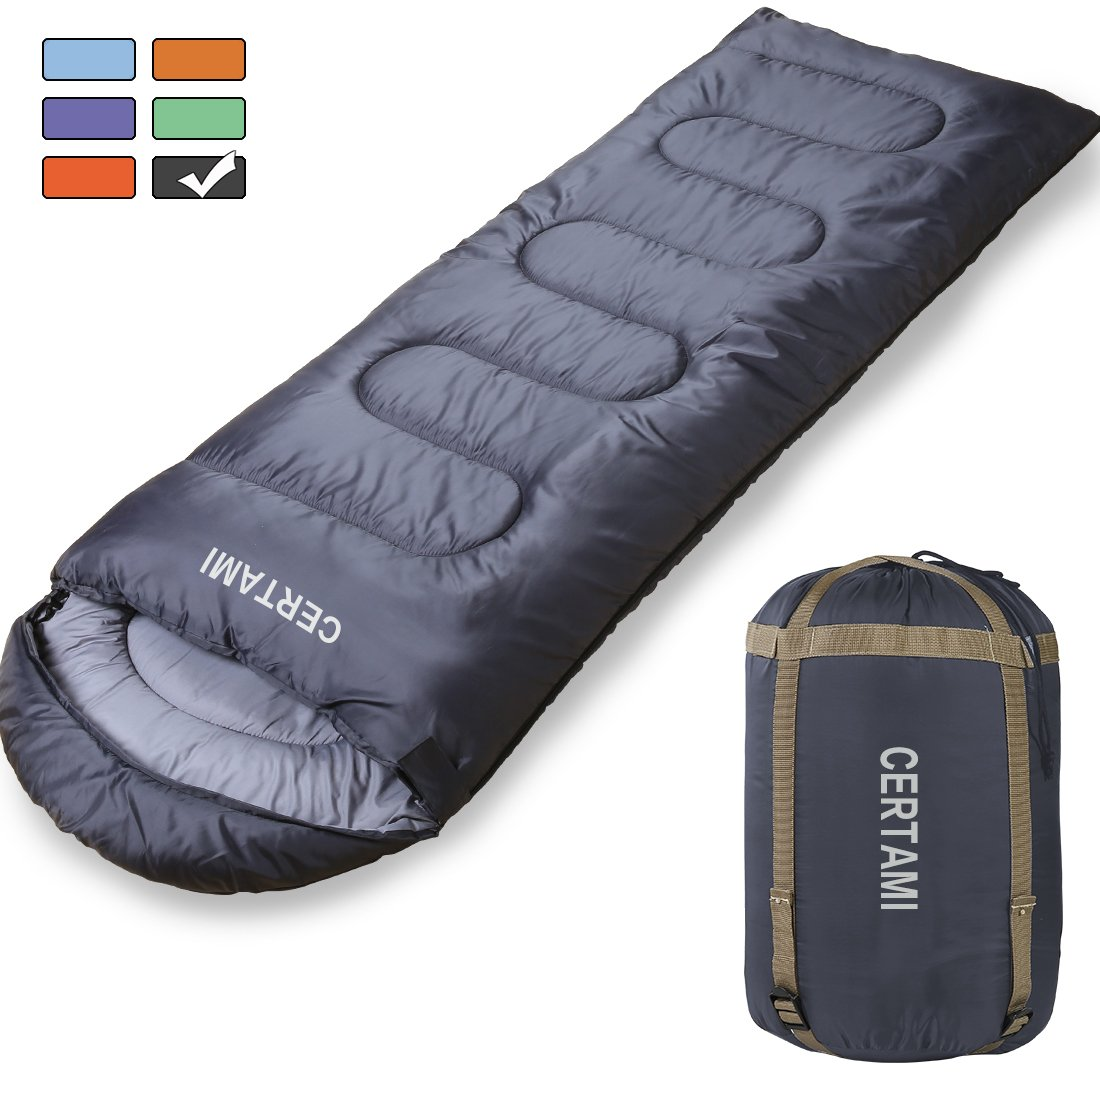 CERTAMI Sleeping Bag -Envelope Lightweight Portable Waterproof,for Adult 3 Season Outdoor Camping Hiking. (Dark Grey/Left Zip) by CERTAMI